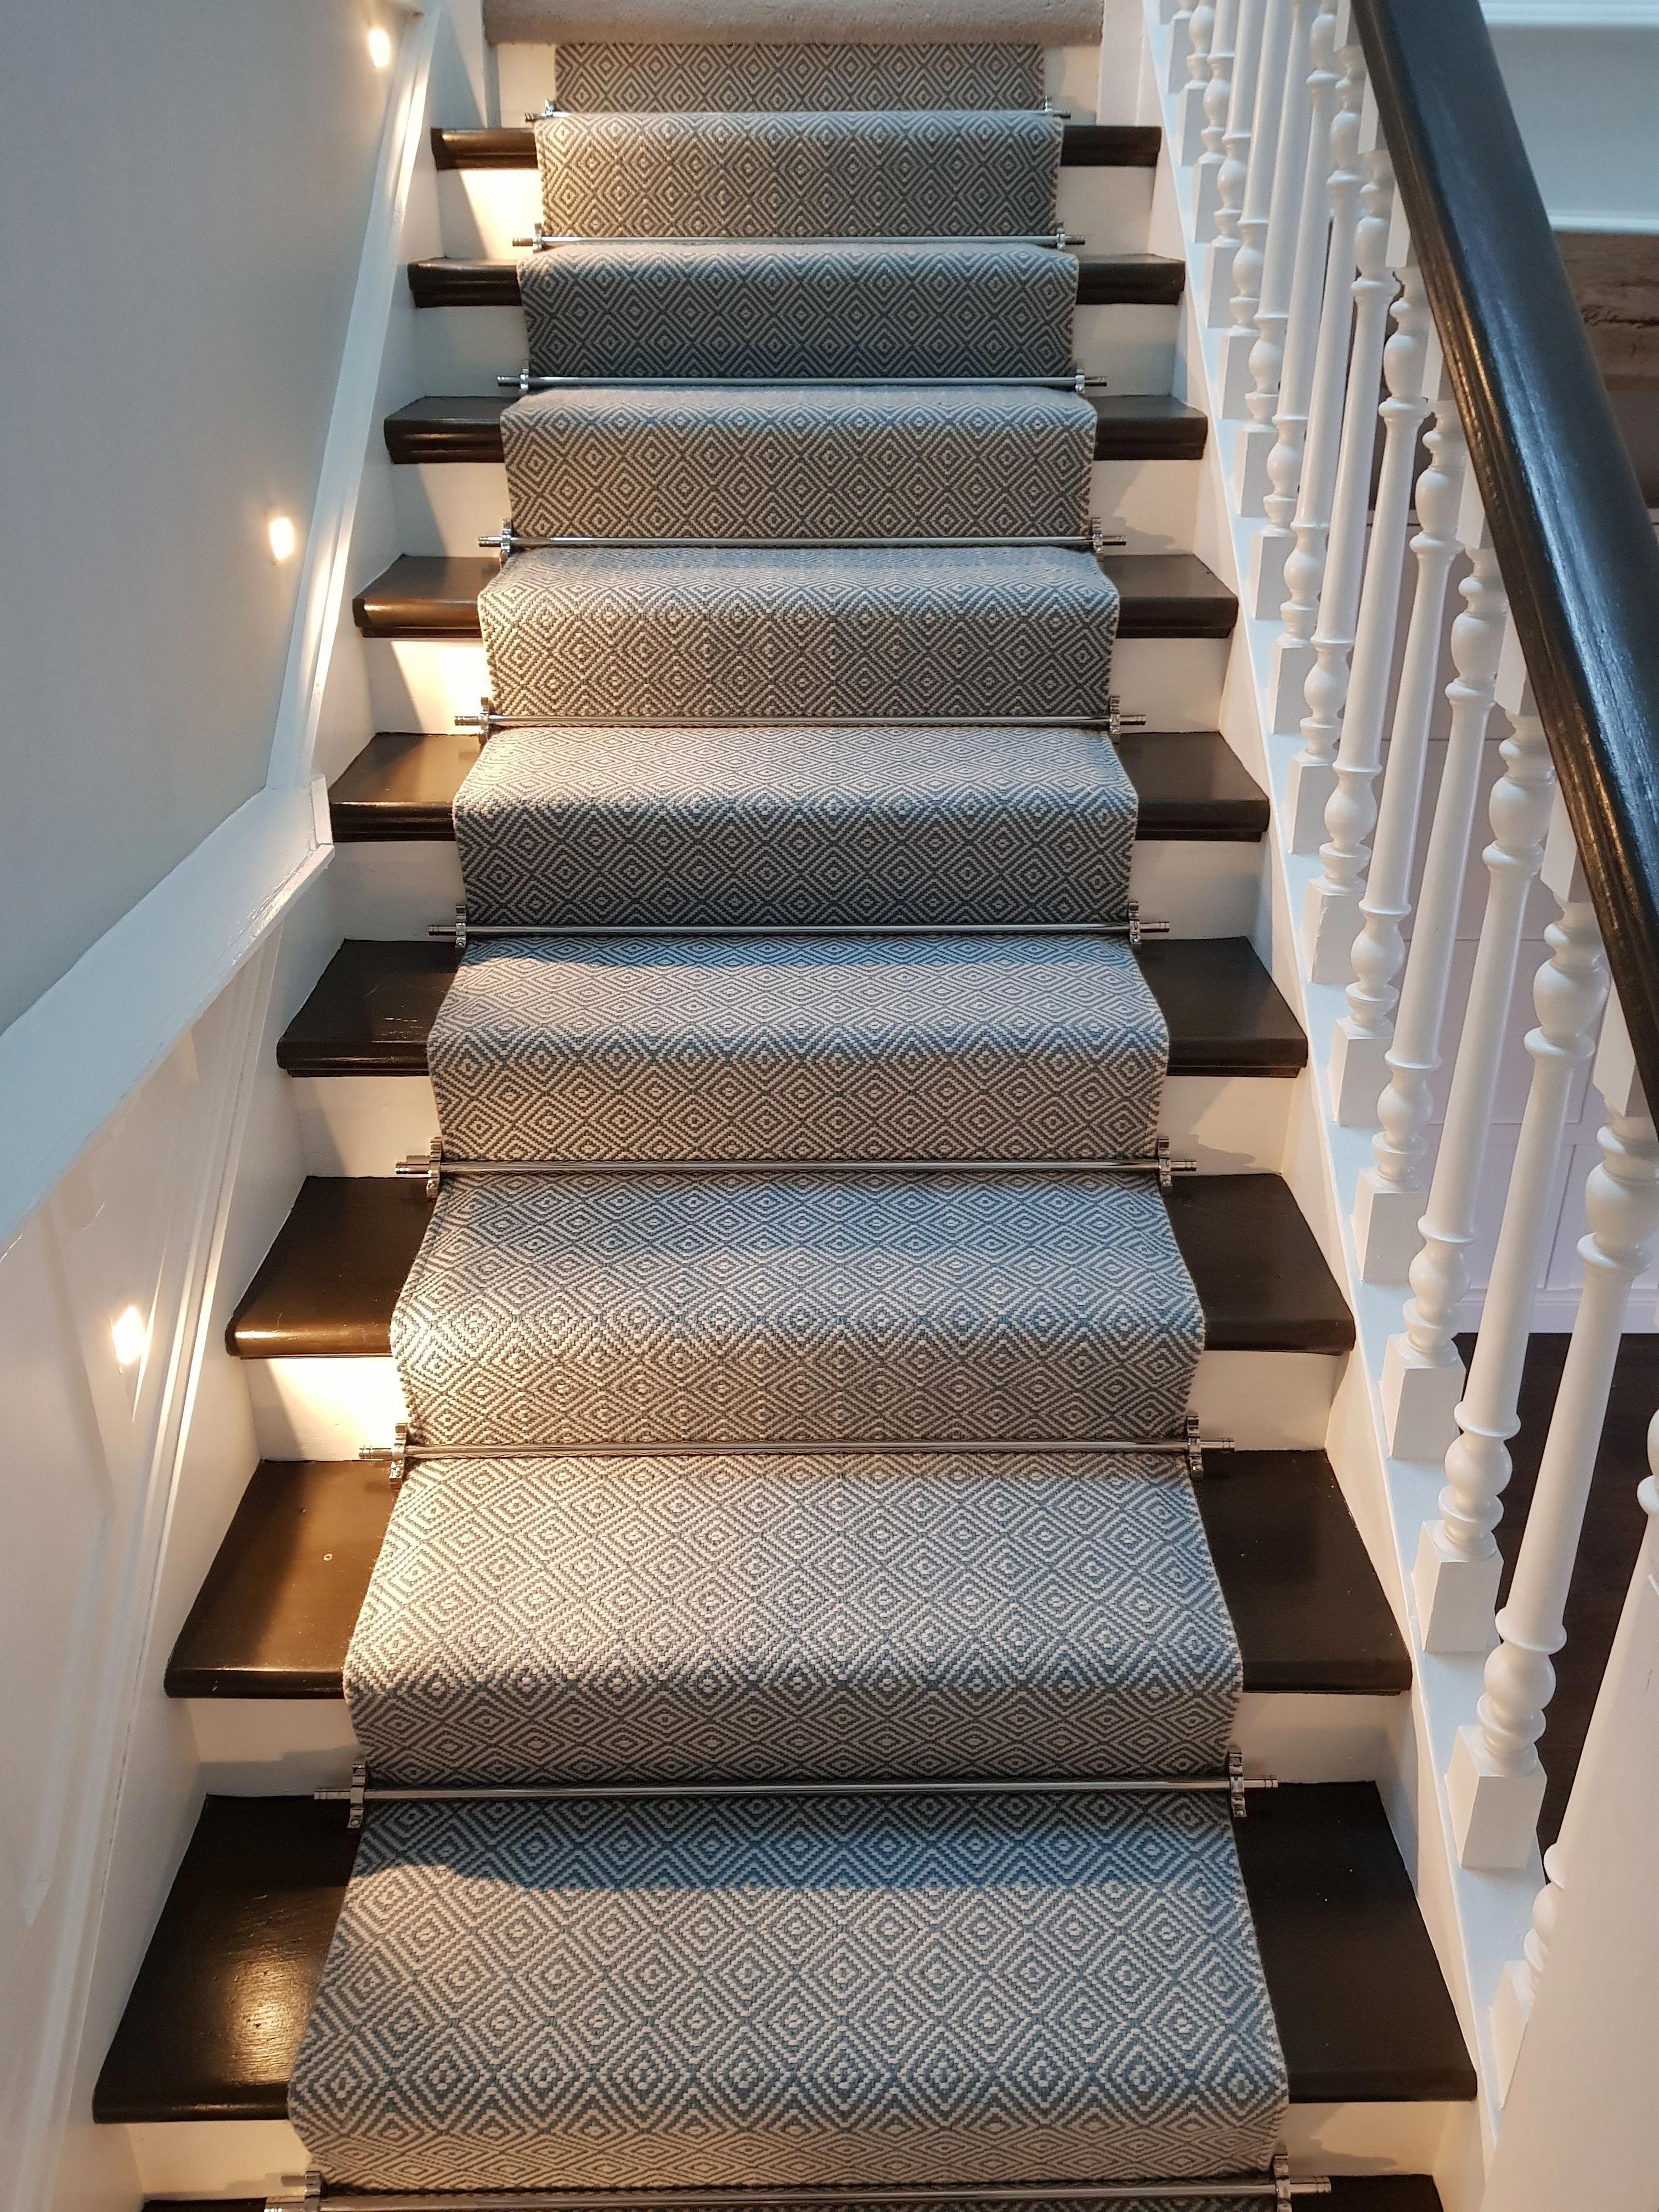 Carpet Runners Uk Contact Number Kitchencarpetrunnersuk Post | Spiral Staircase Carpet Runners | Staircase Ideas | Staircase Railings | Stair Case | Beige Carpet | Sisal Stair